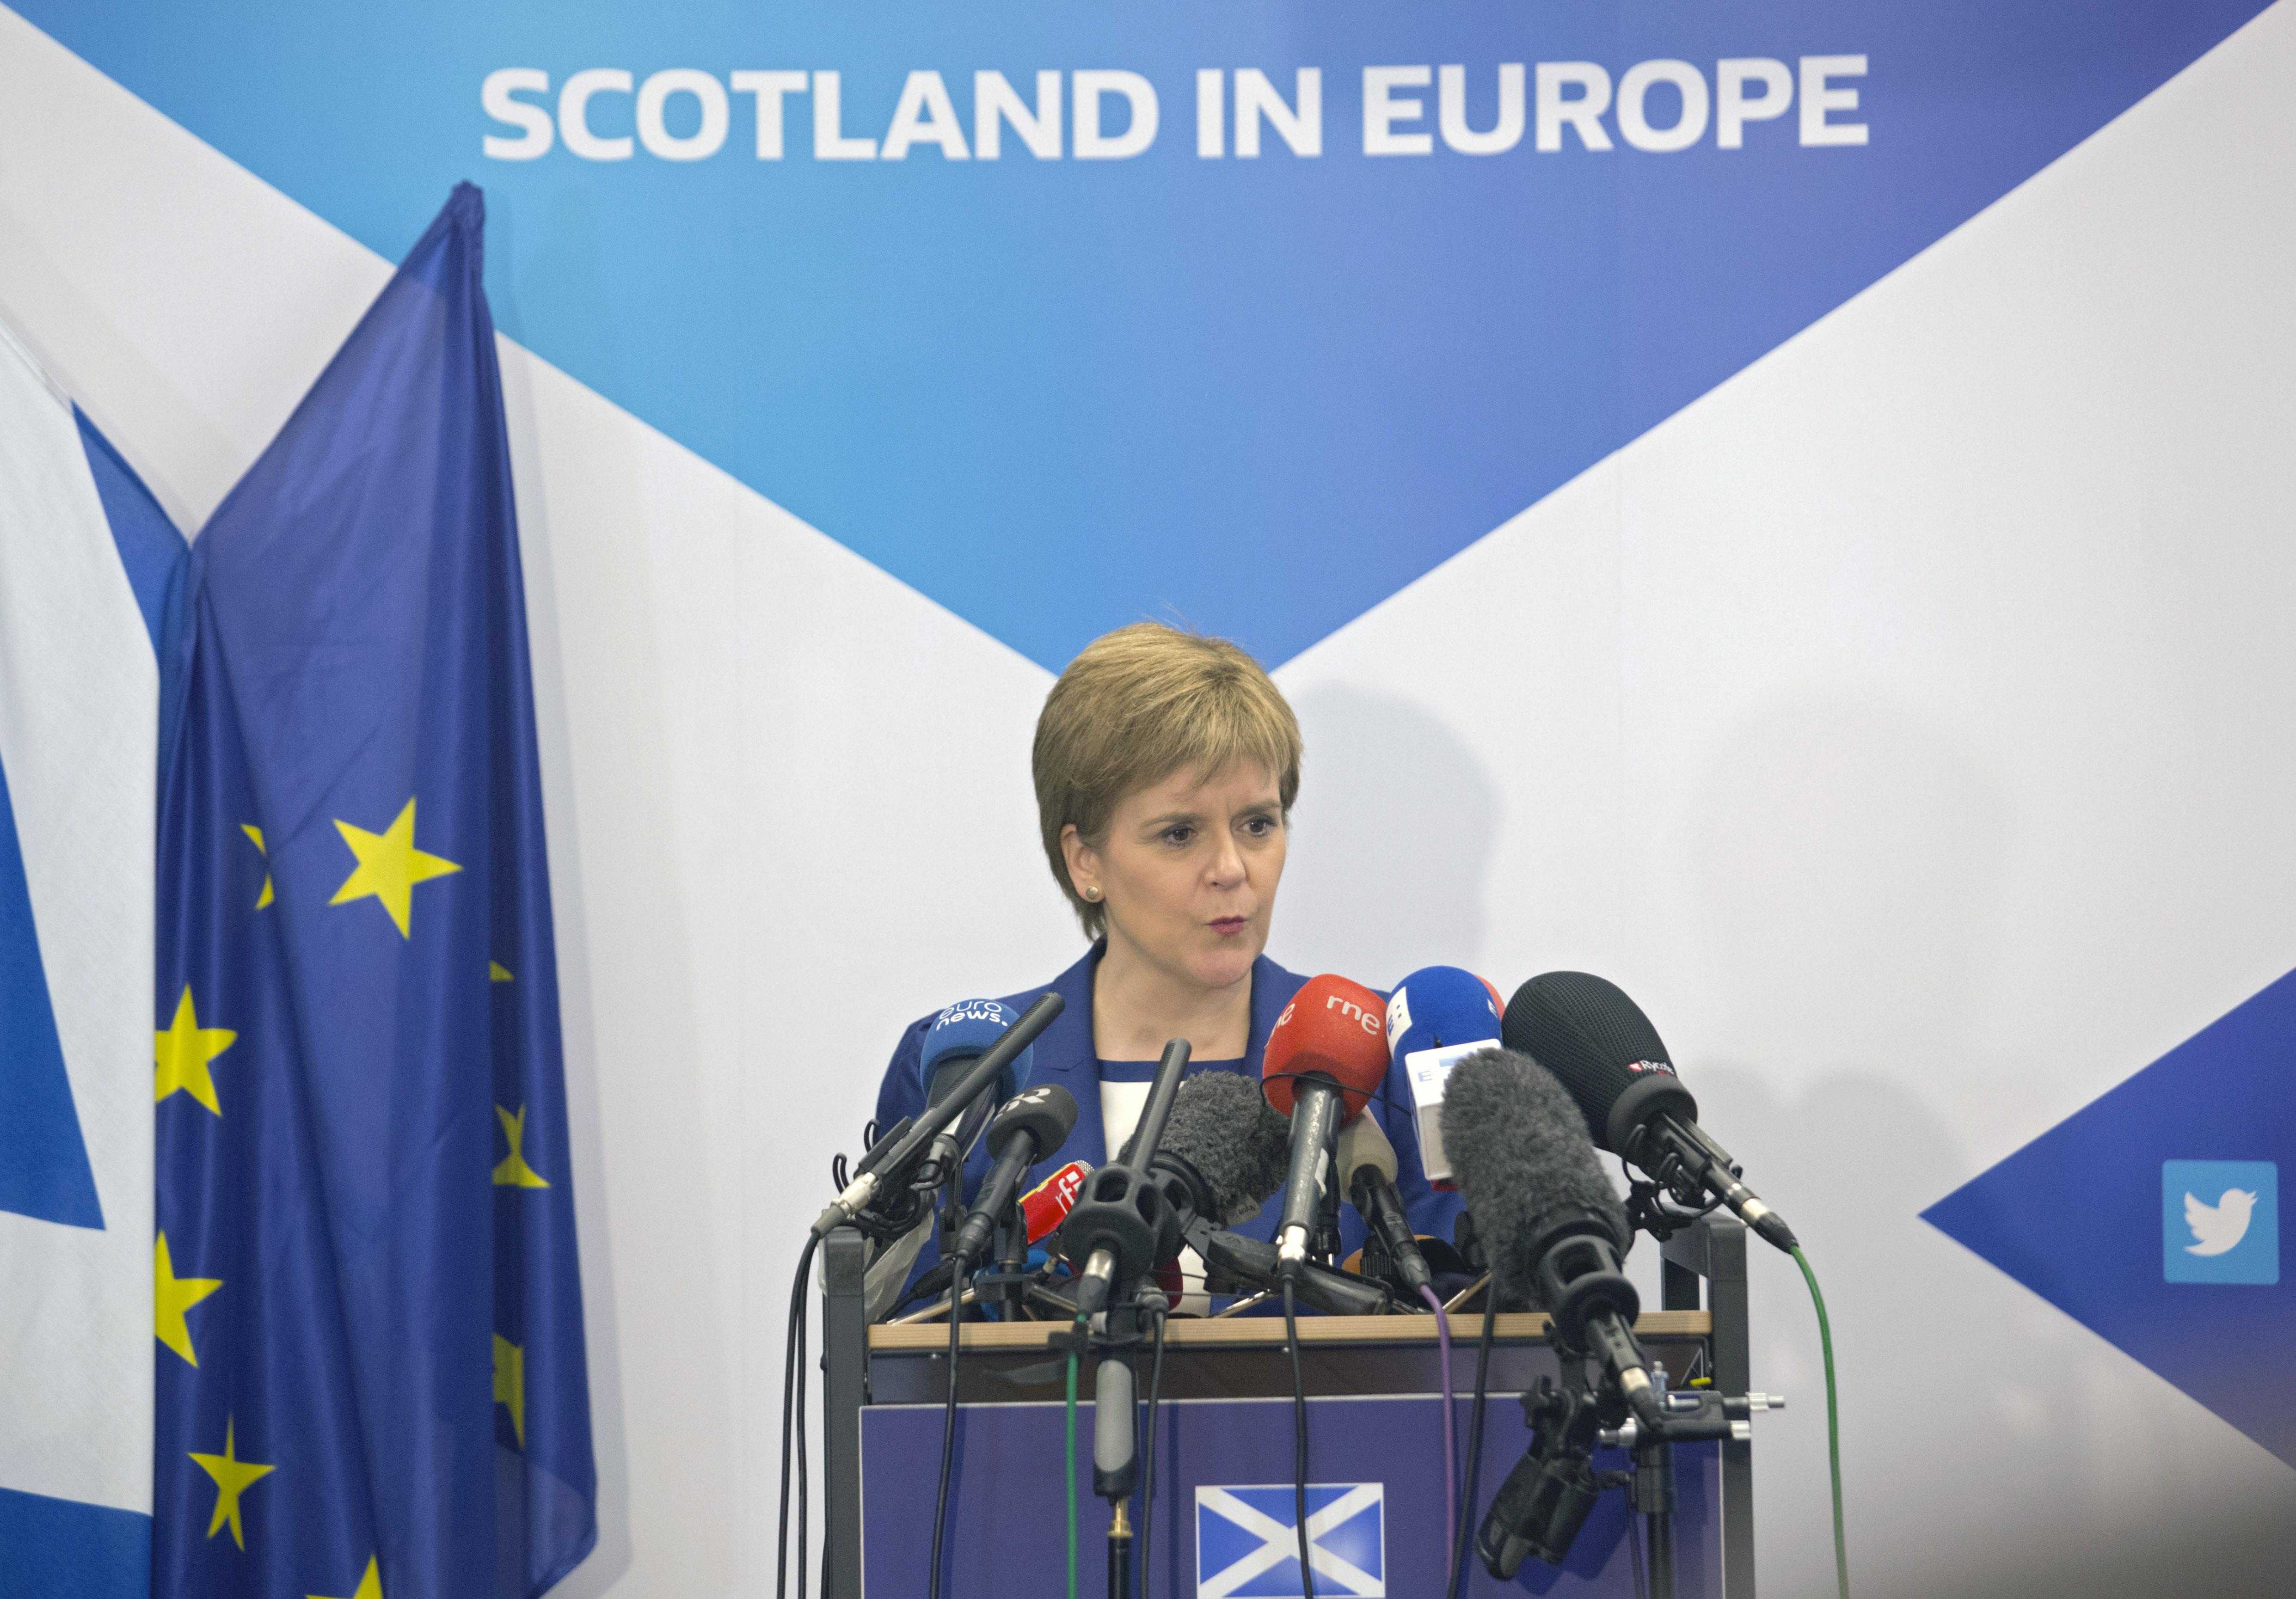 Премьер-министр Шотландии Никола Стерджен. Фото: EPA